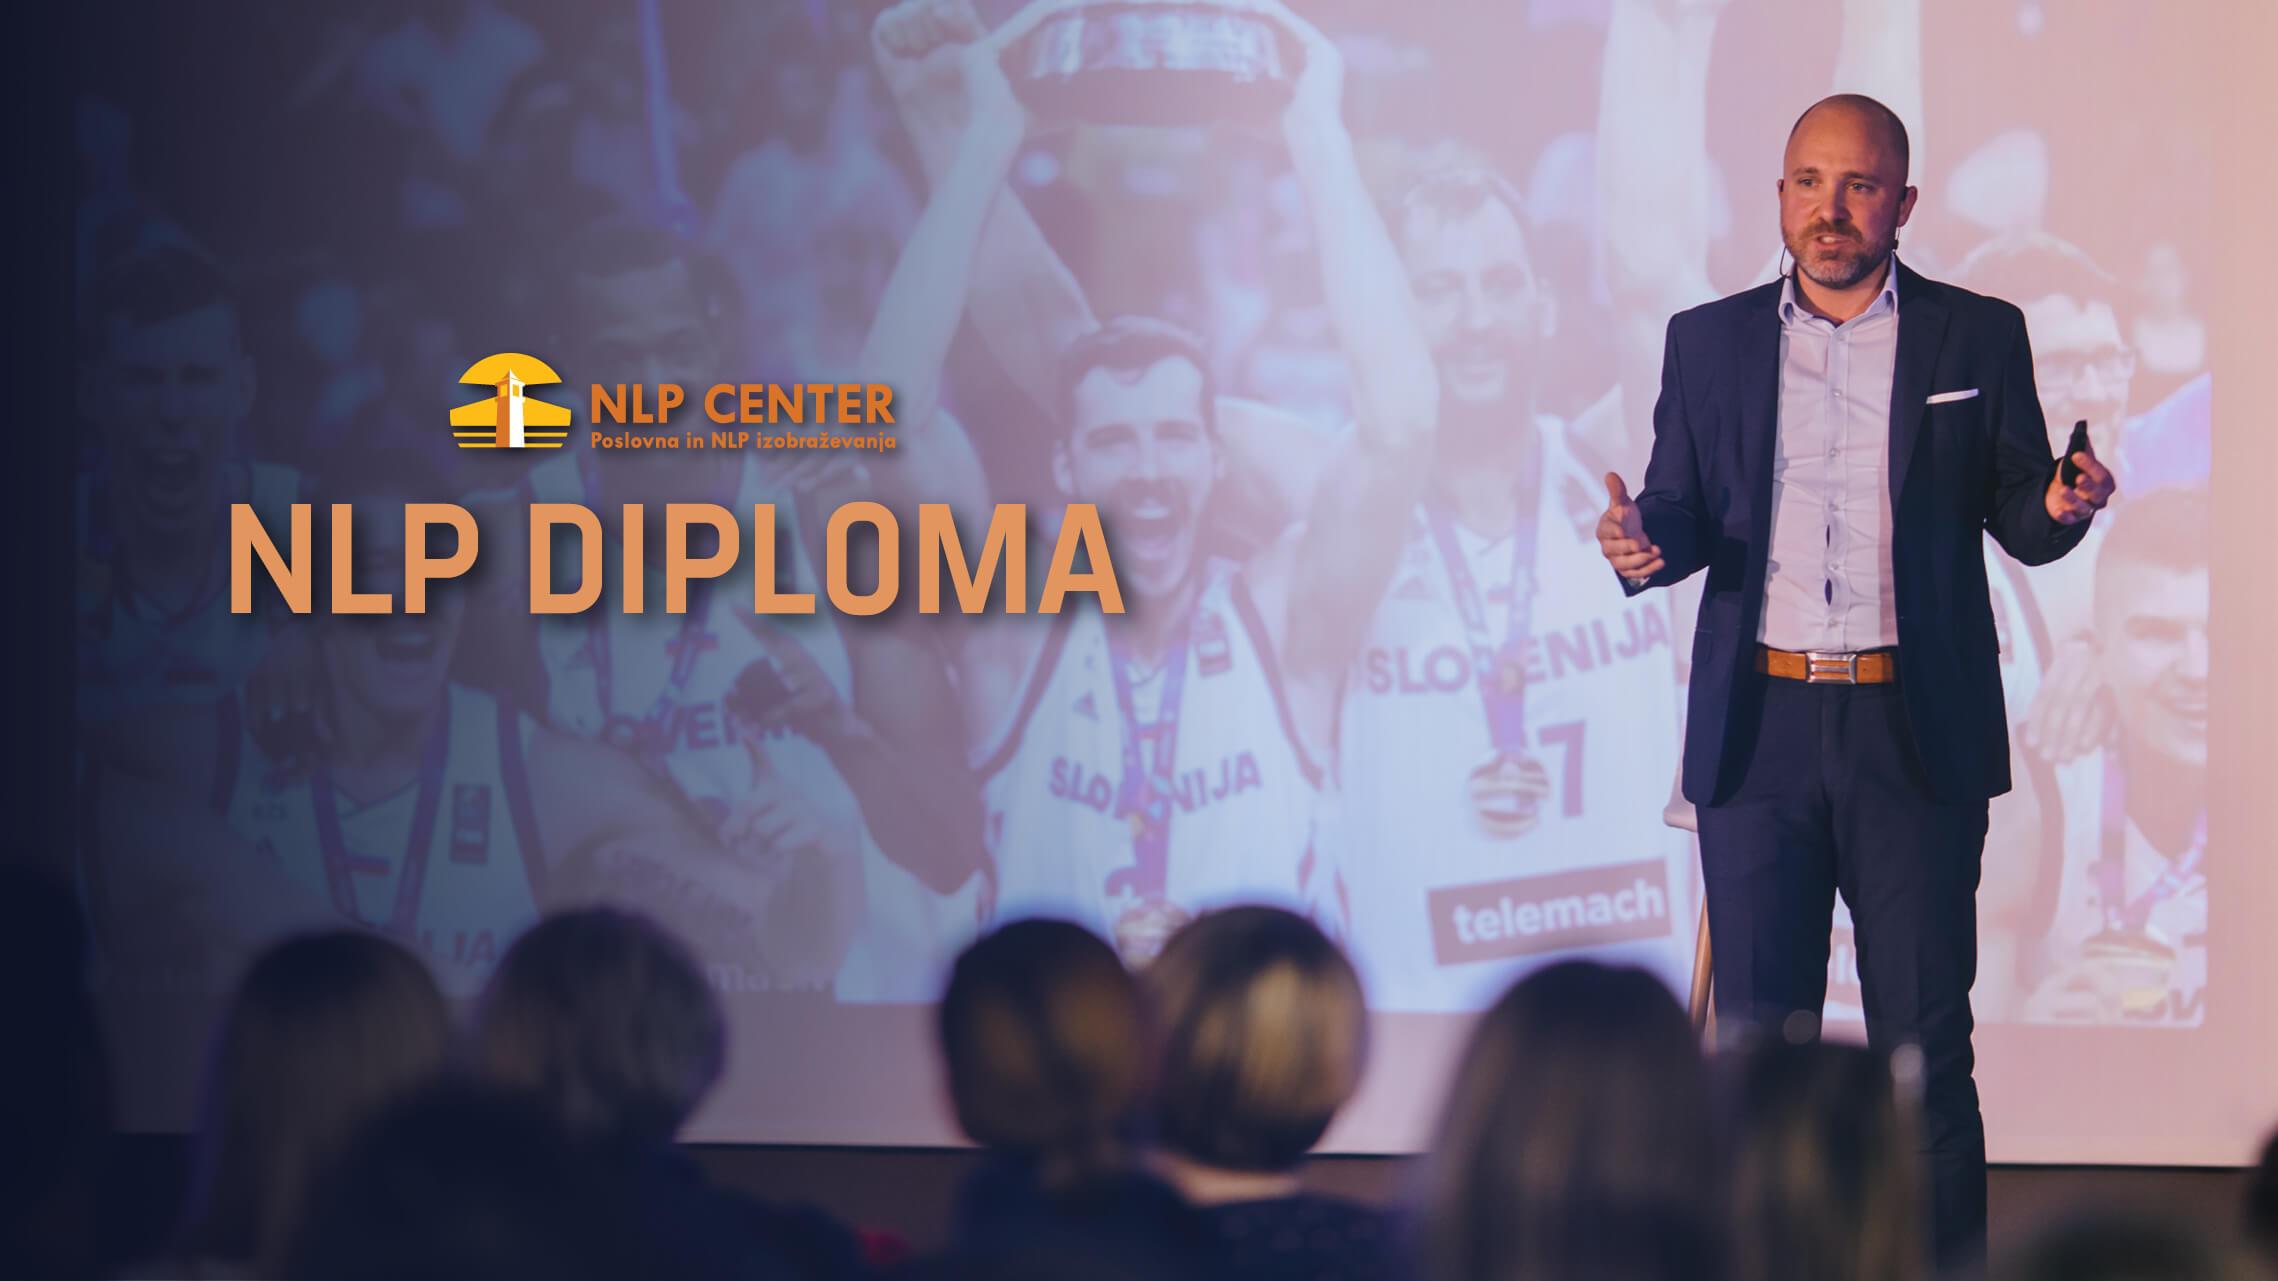 NLP Diploma - Maribor